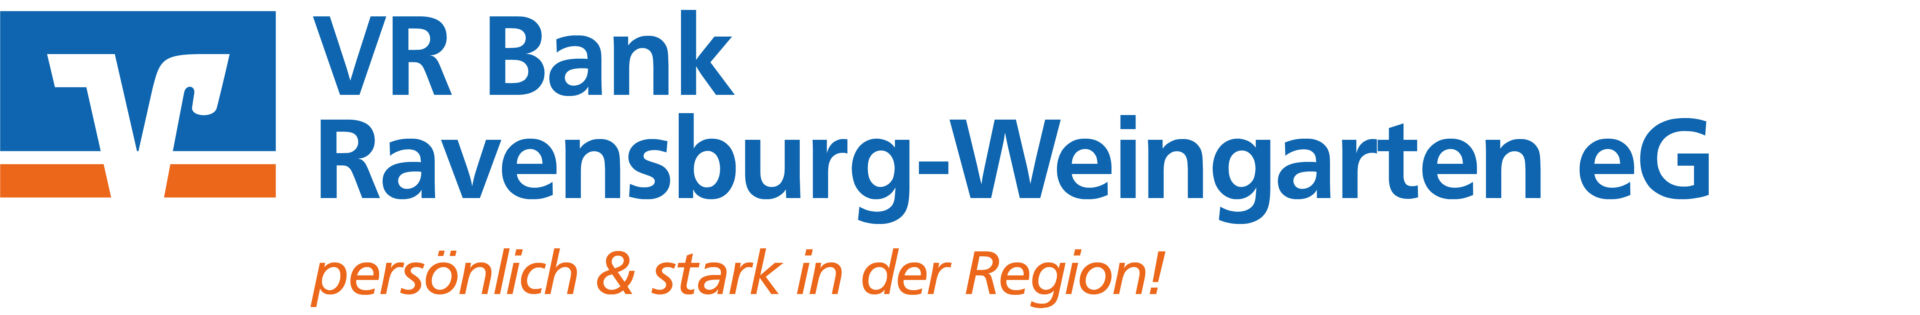 https://www.bsv-rv.de/wp-content/uploads/2020/12/Logo_VR-Bank_RGB.jpg